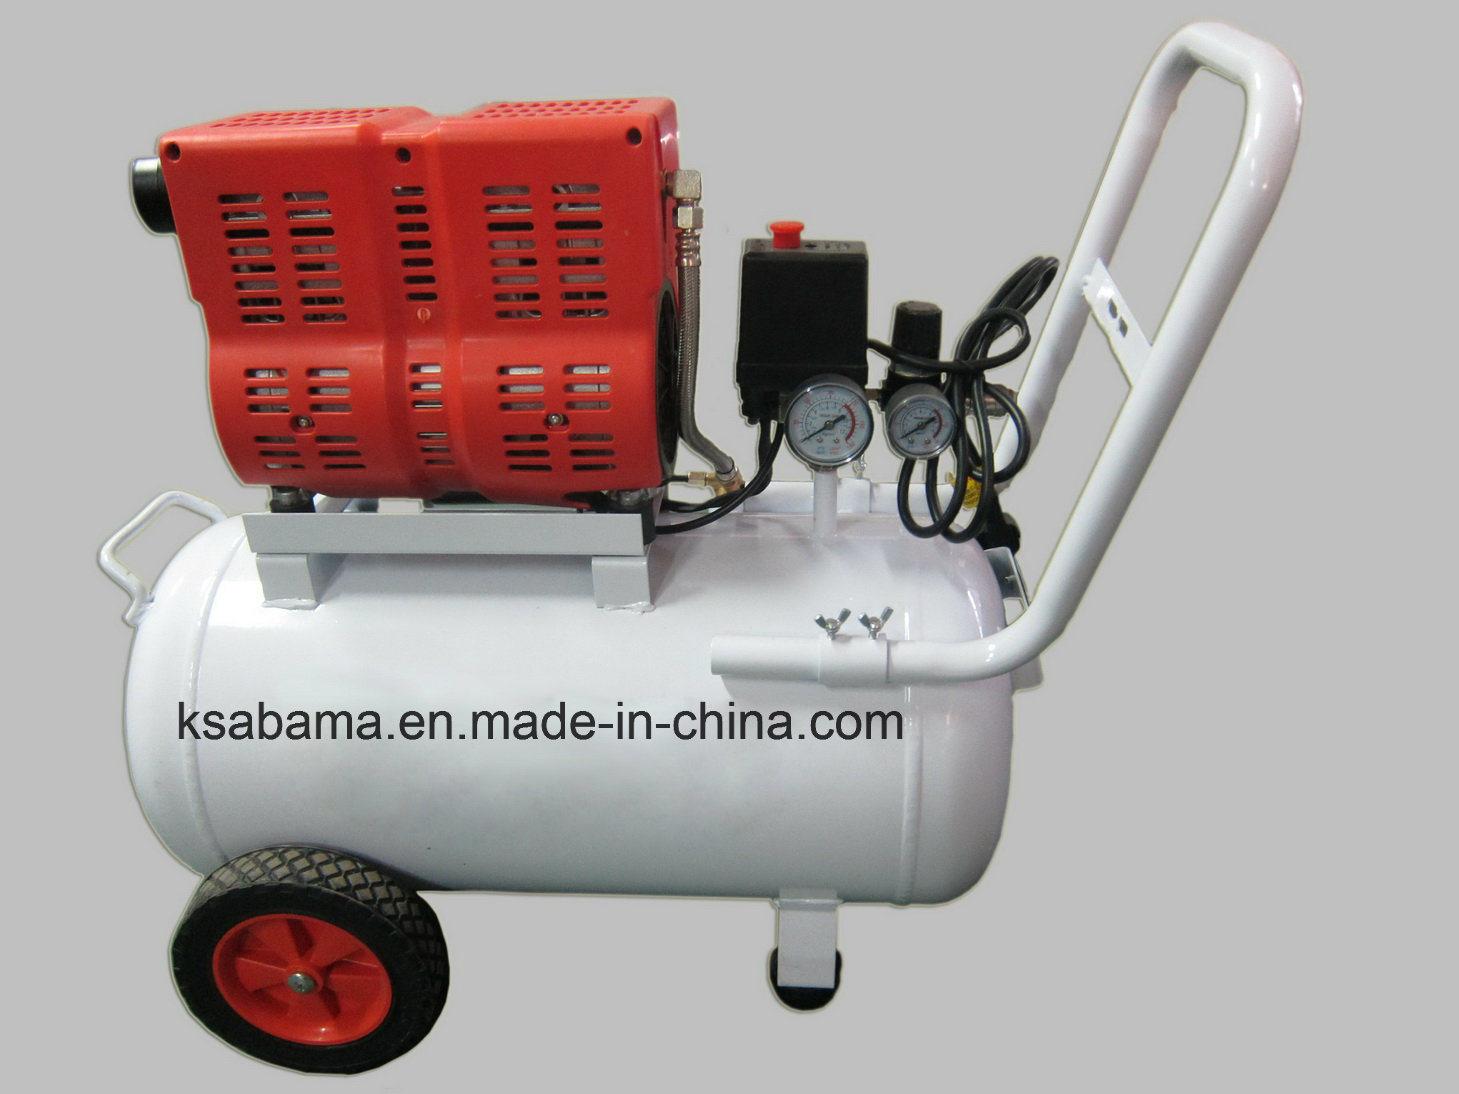 Tat-1030 1.0HP 30L Portable Oil Free Silent Air Compressor